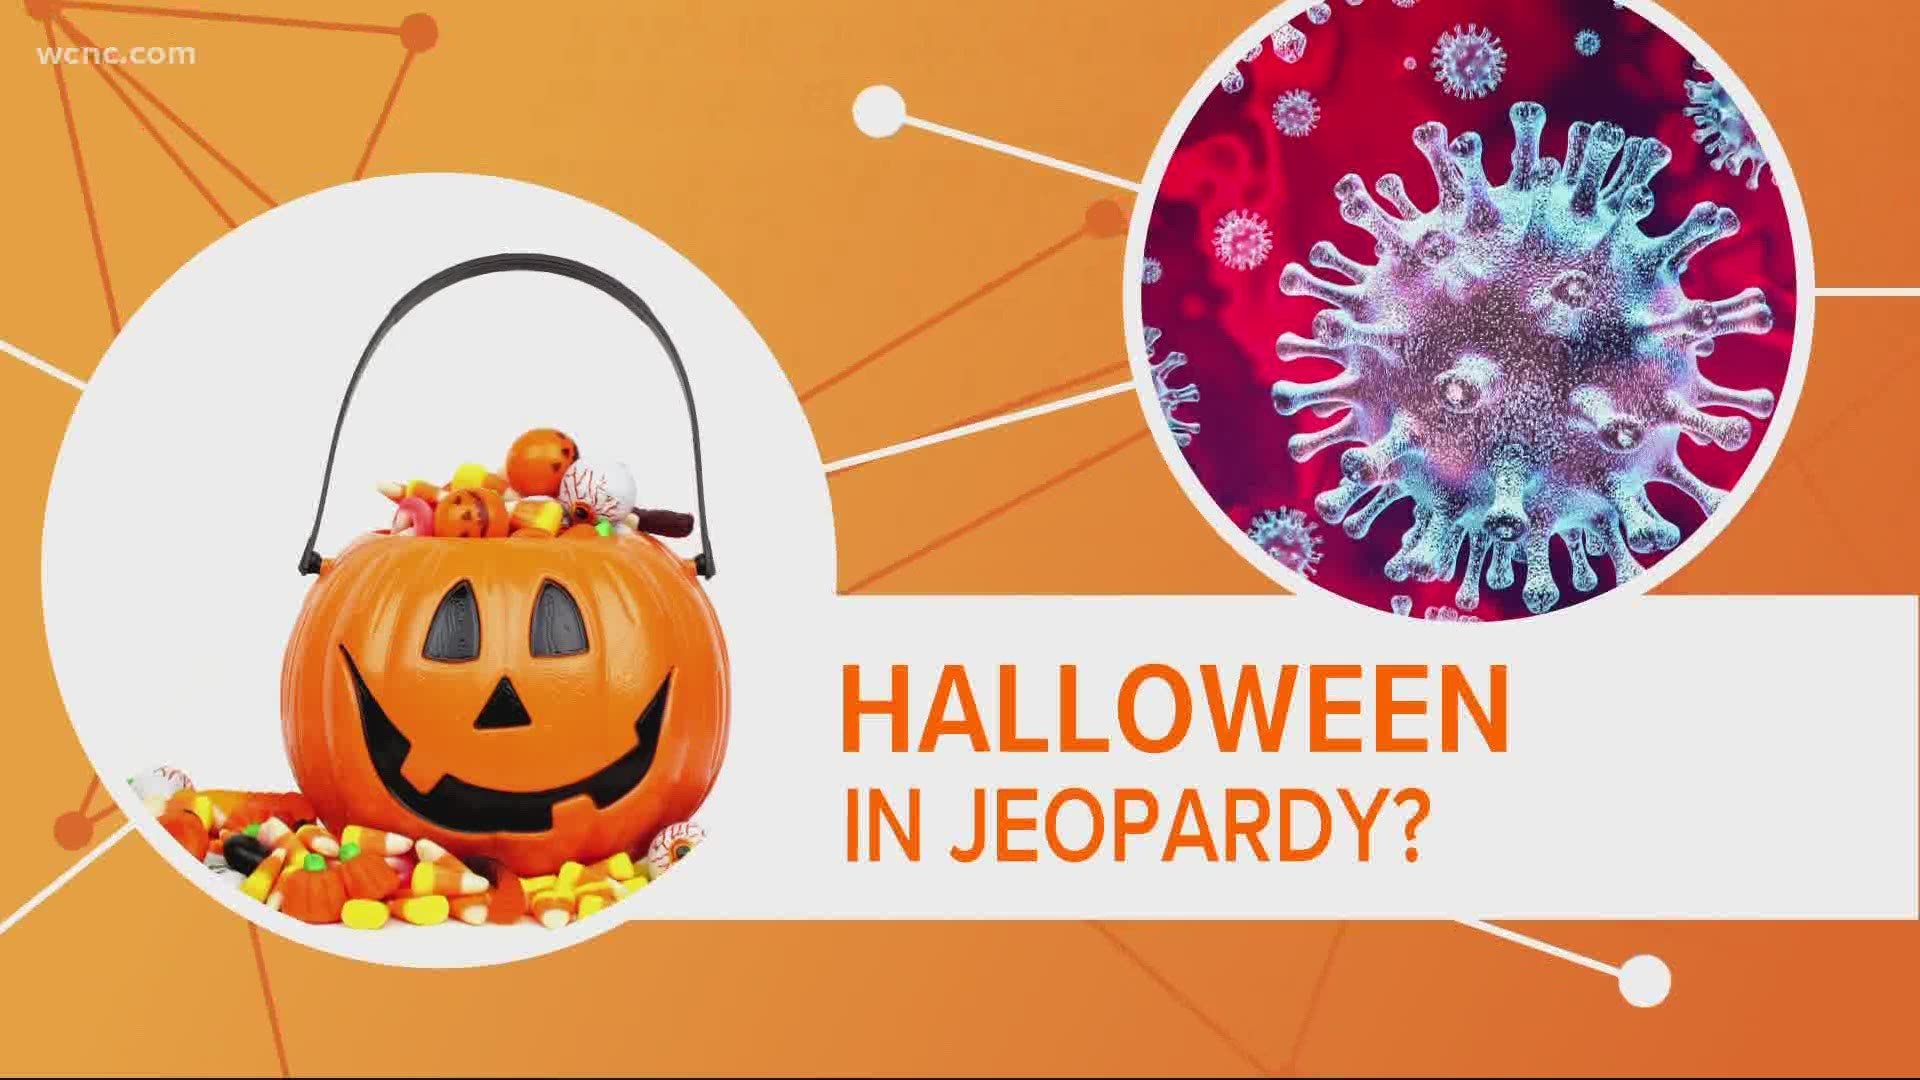 Missori Cancelled Halloween 2020 Trick or treat: Will COVID 19 cancel Halloween in 2020? | ksdk.com